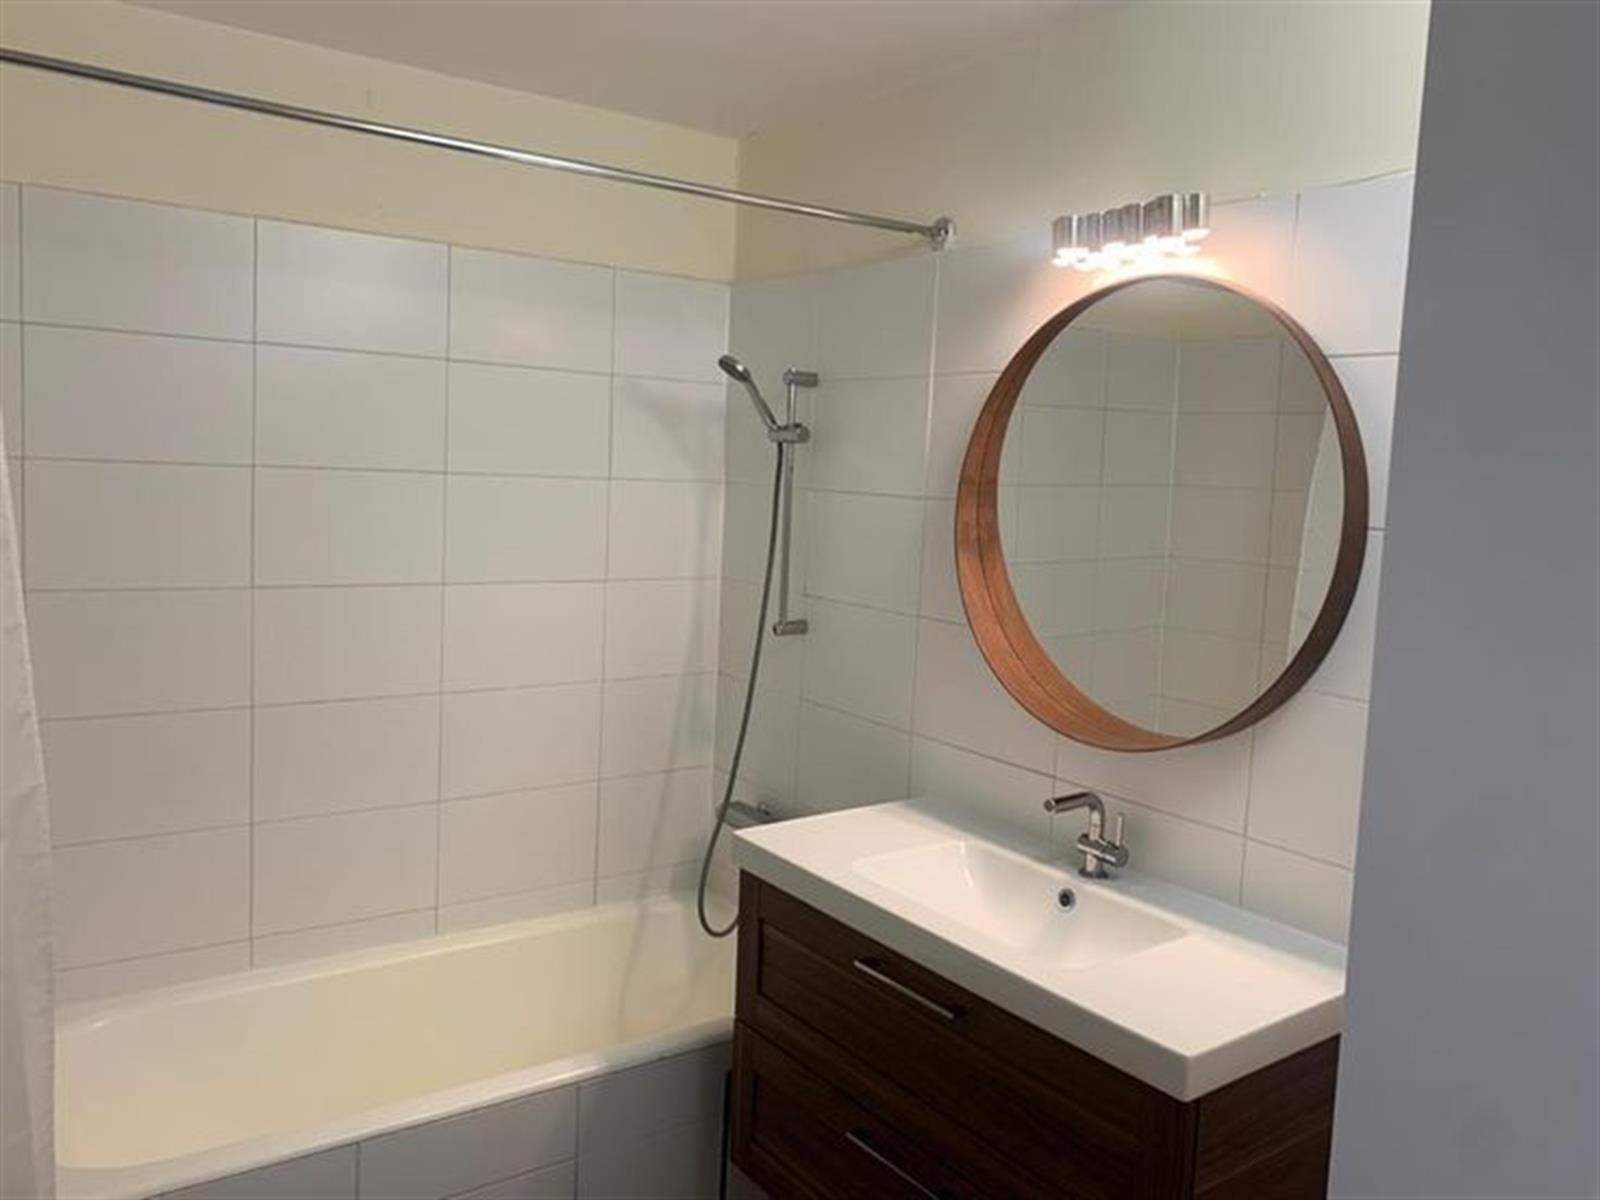 Appartement - Woluwe-Saint-Lambert - #4399349-9